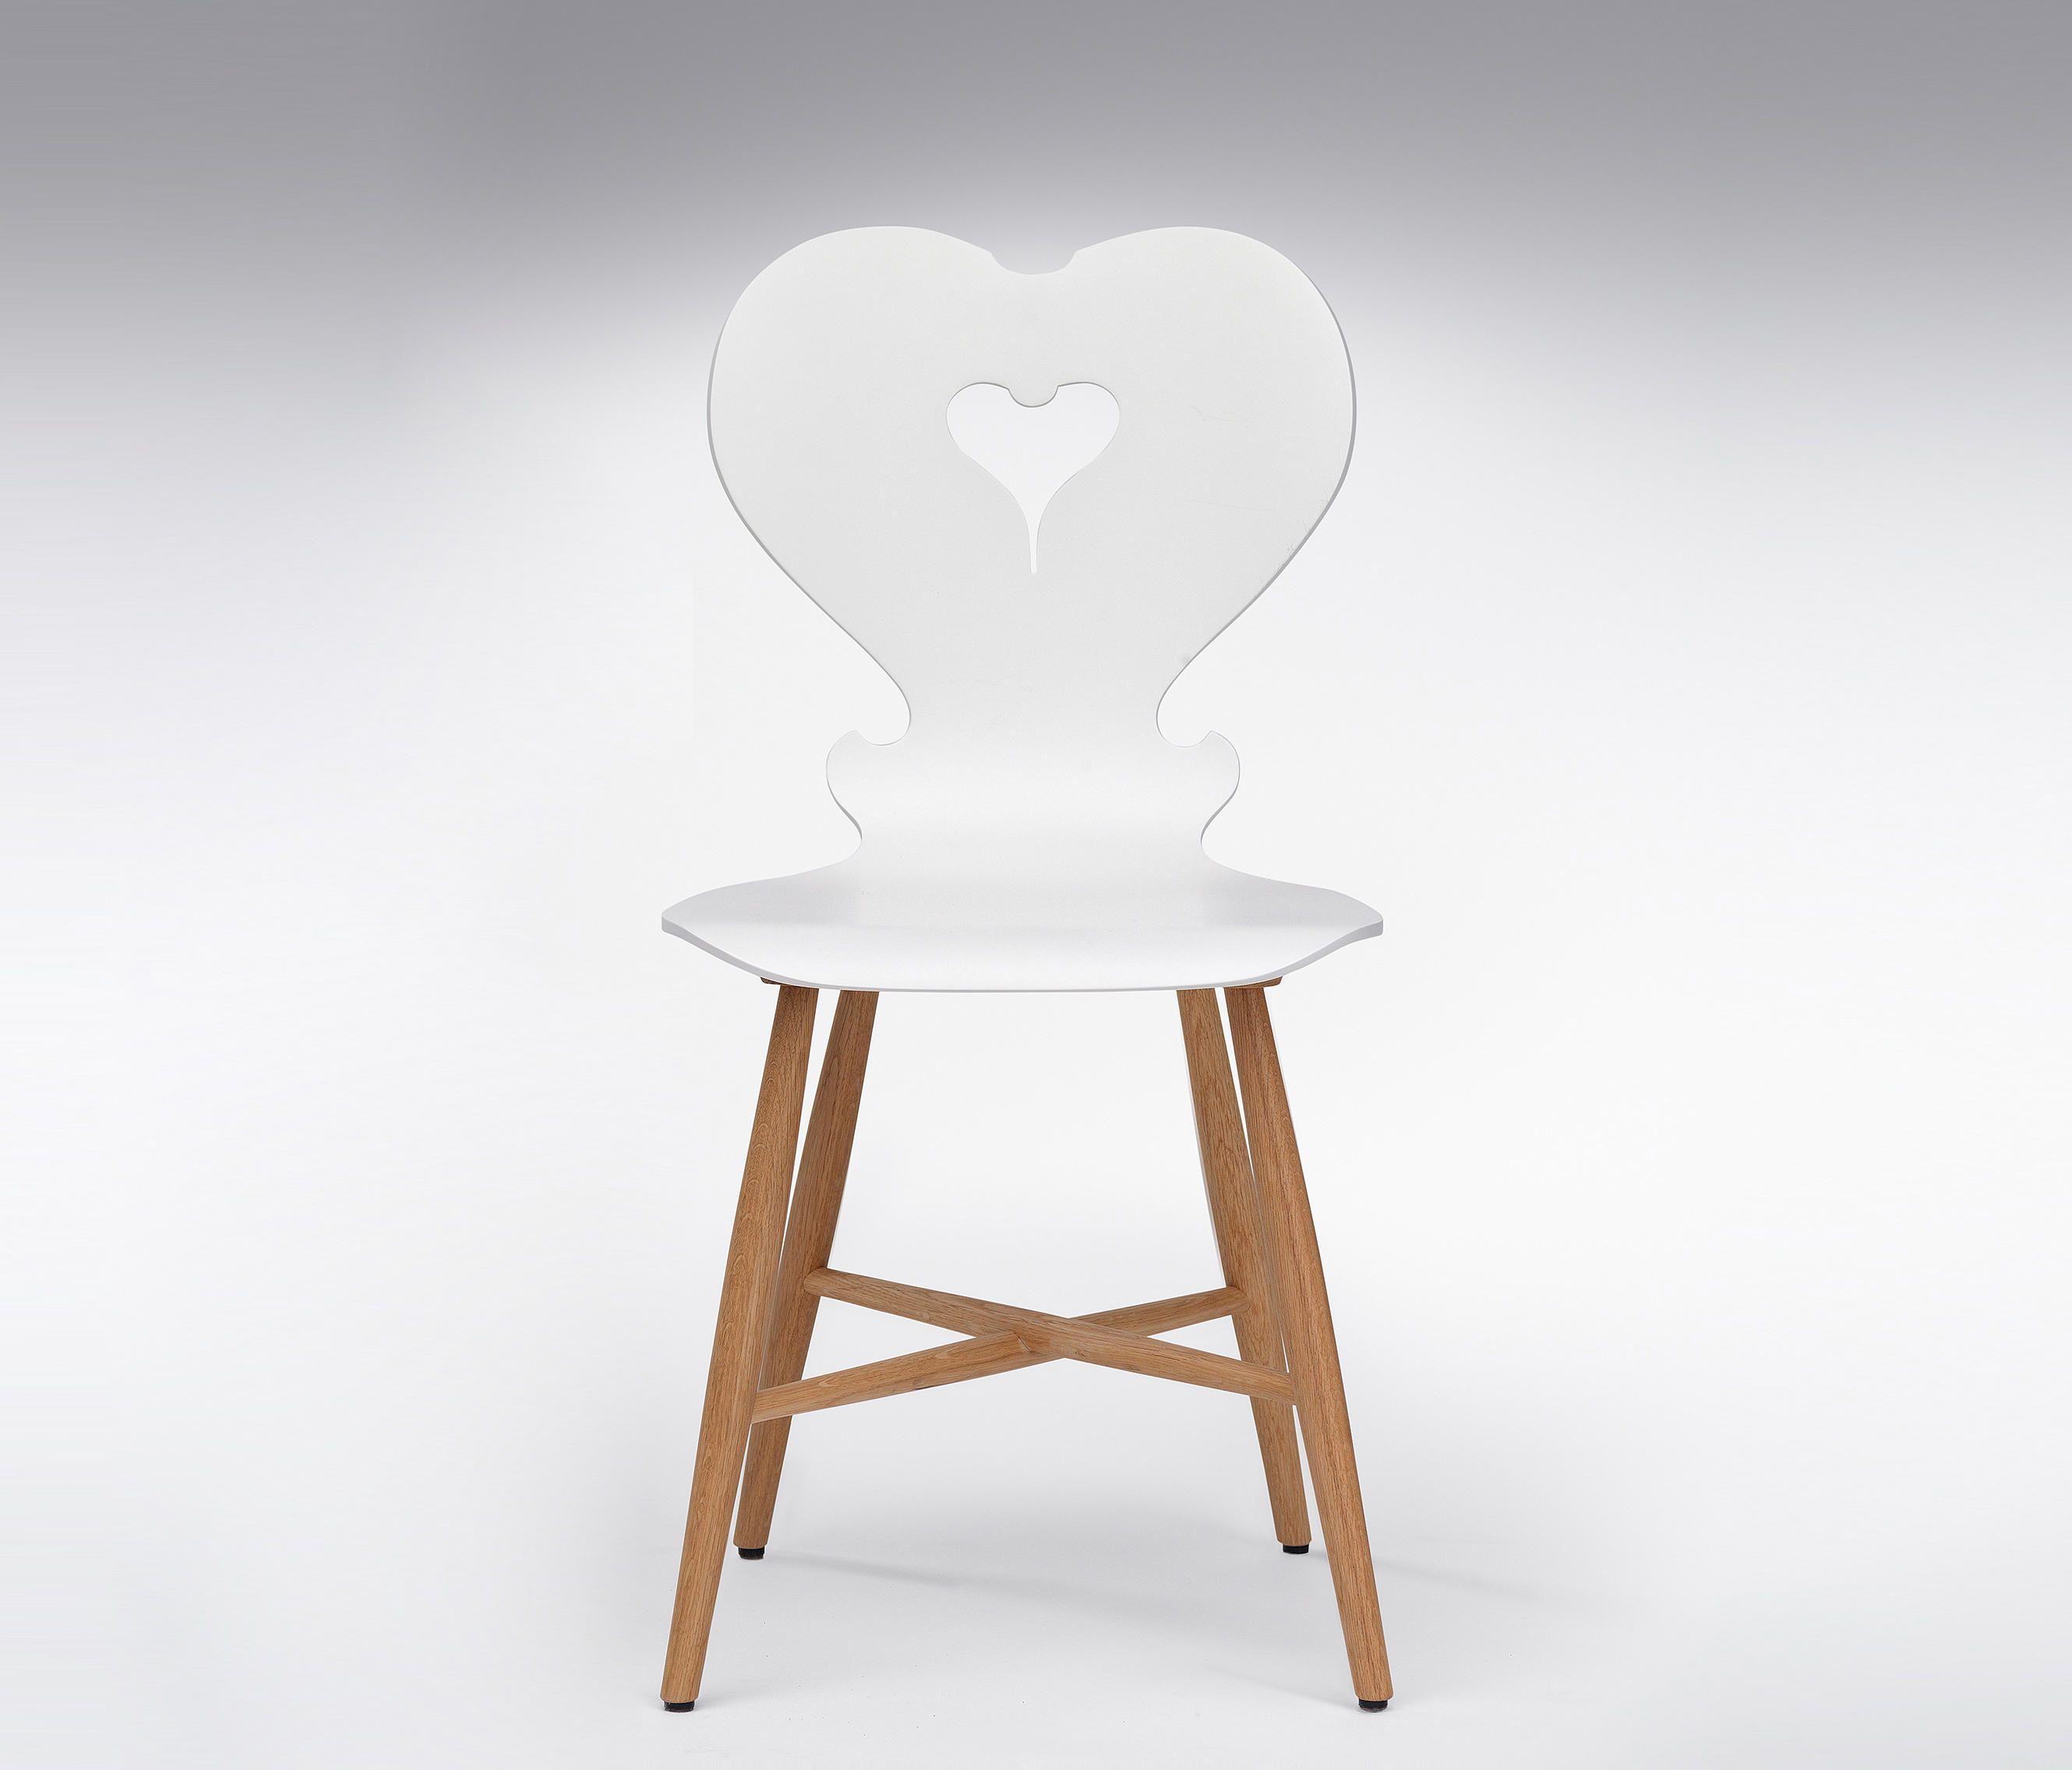 Stühle L Möbelbau Schmidinger Designer TrixStuhl Von 1JFclT3K